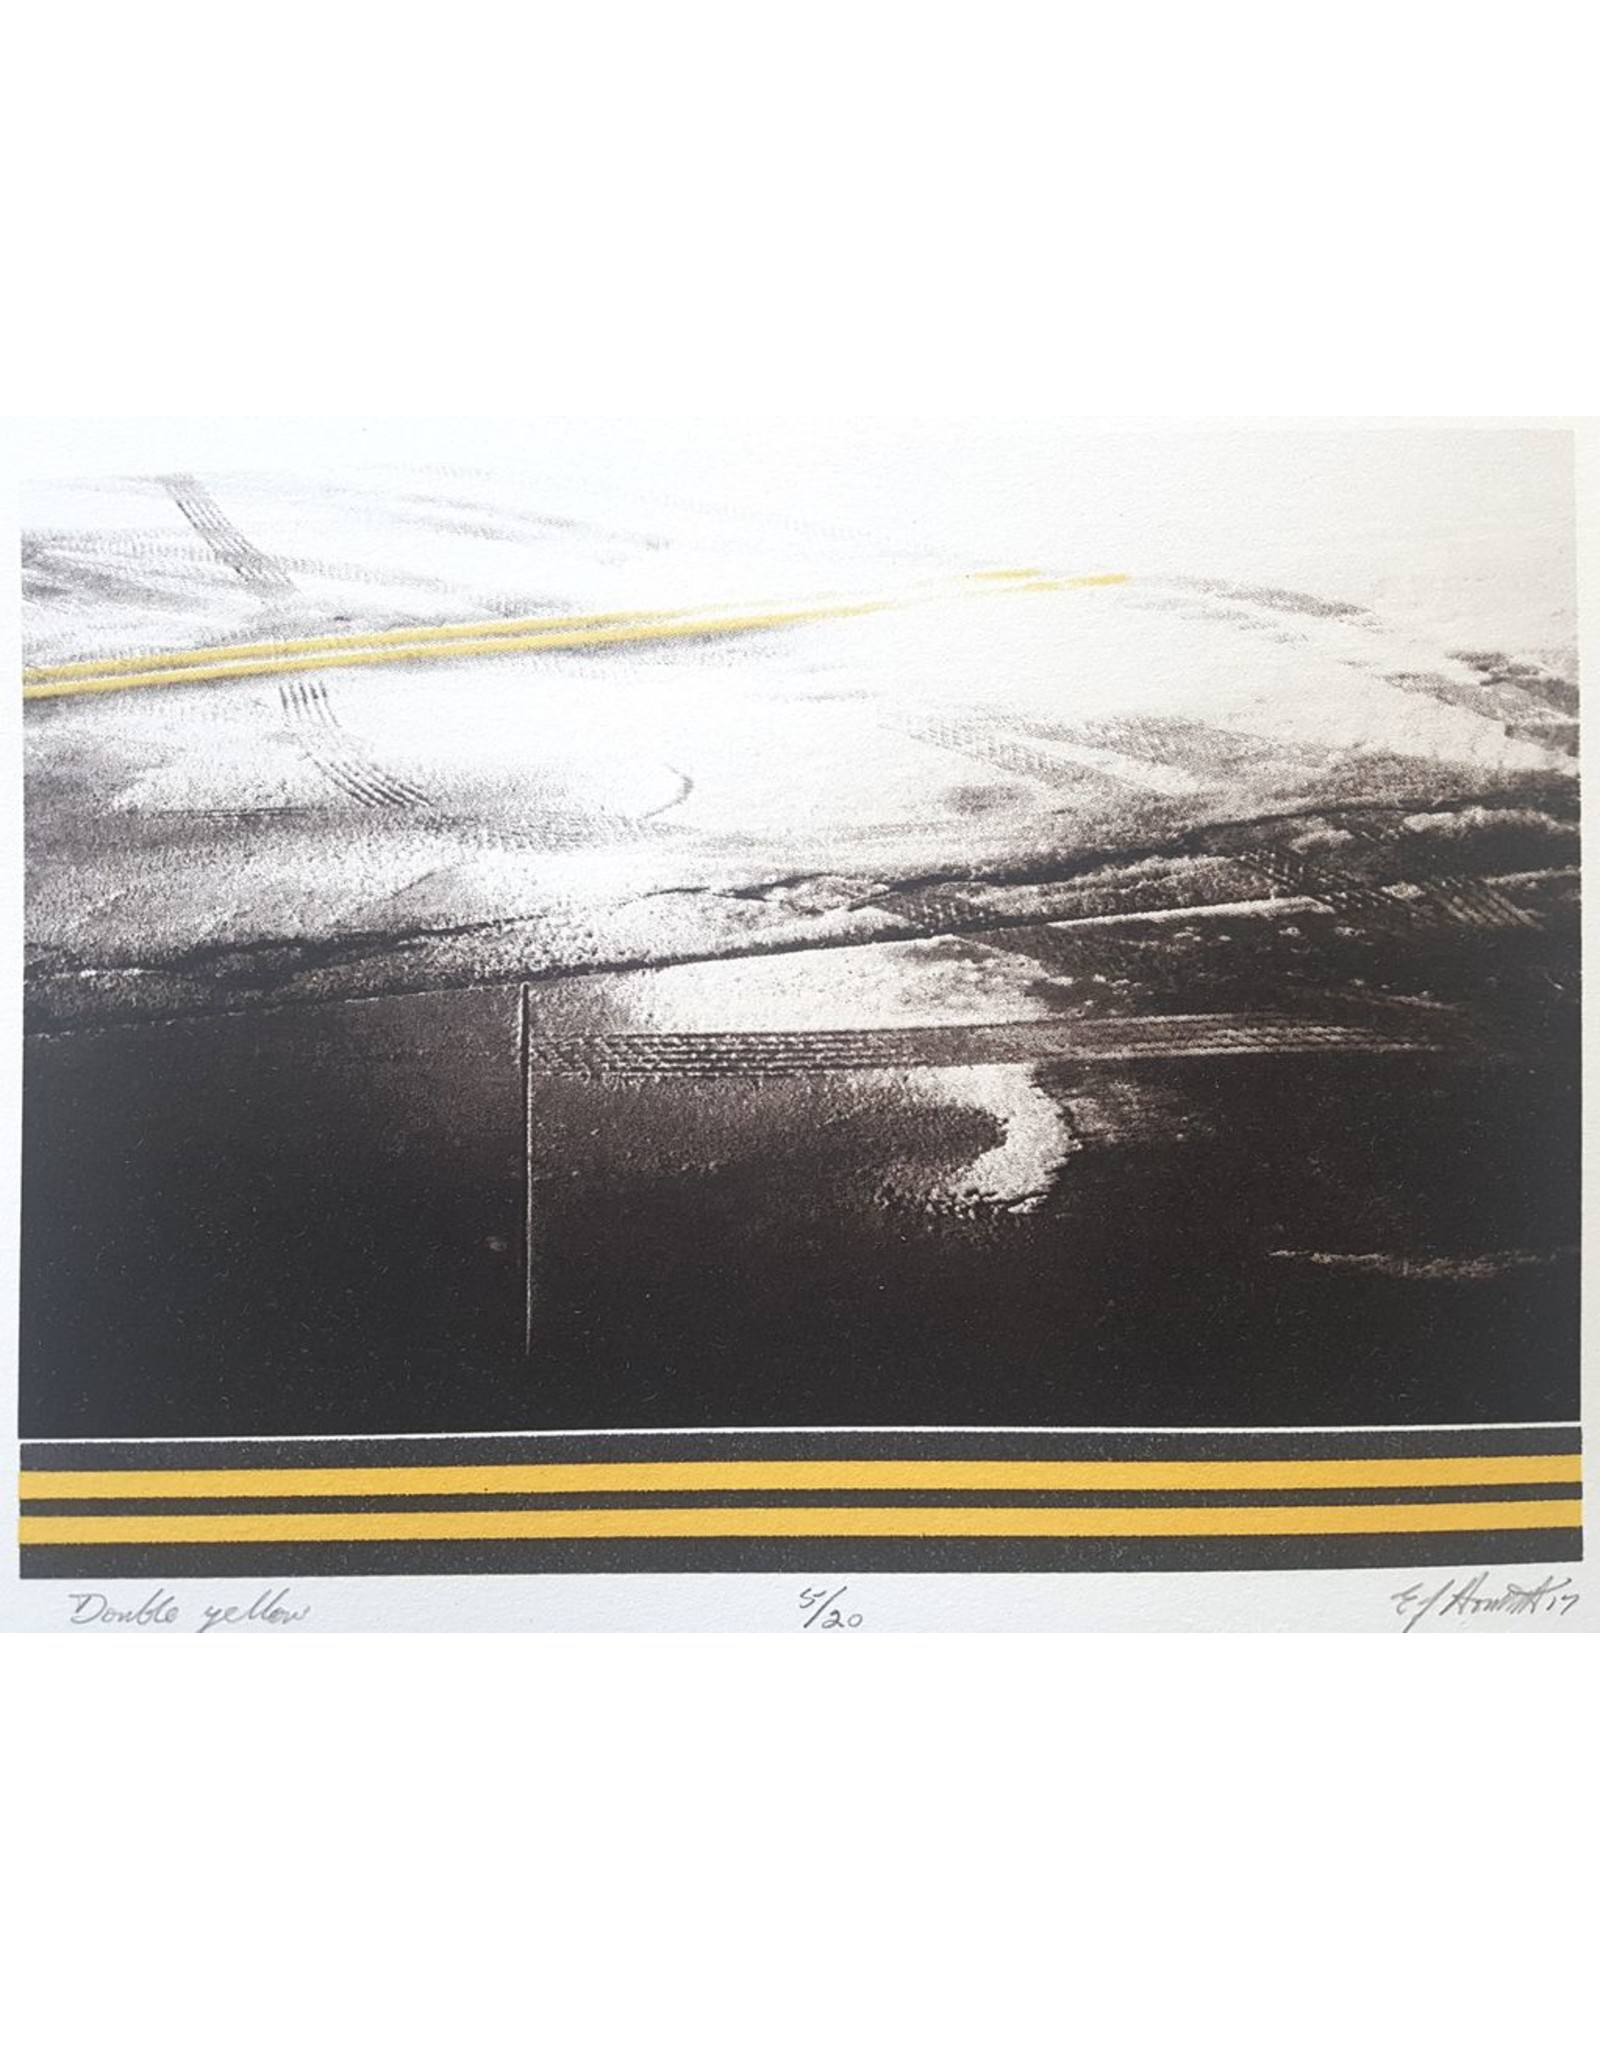 Howorth, E.J. Double yellow